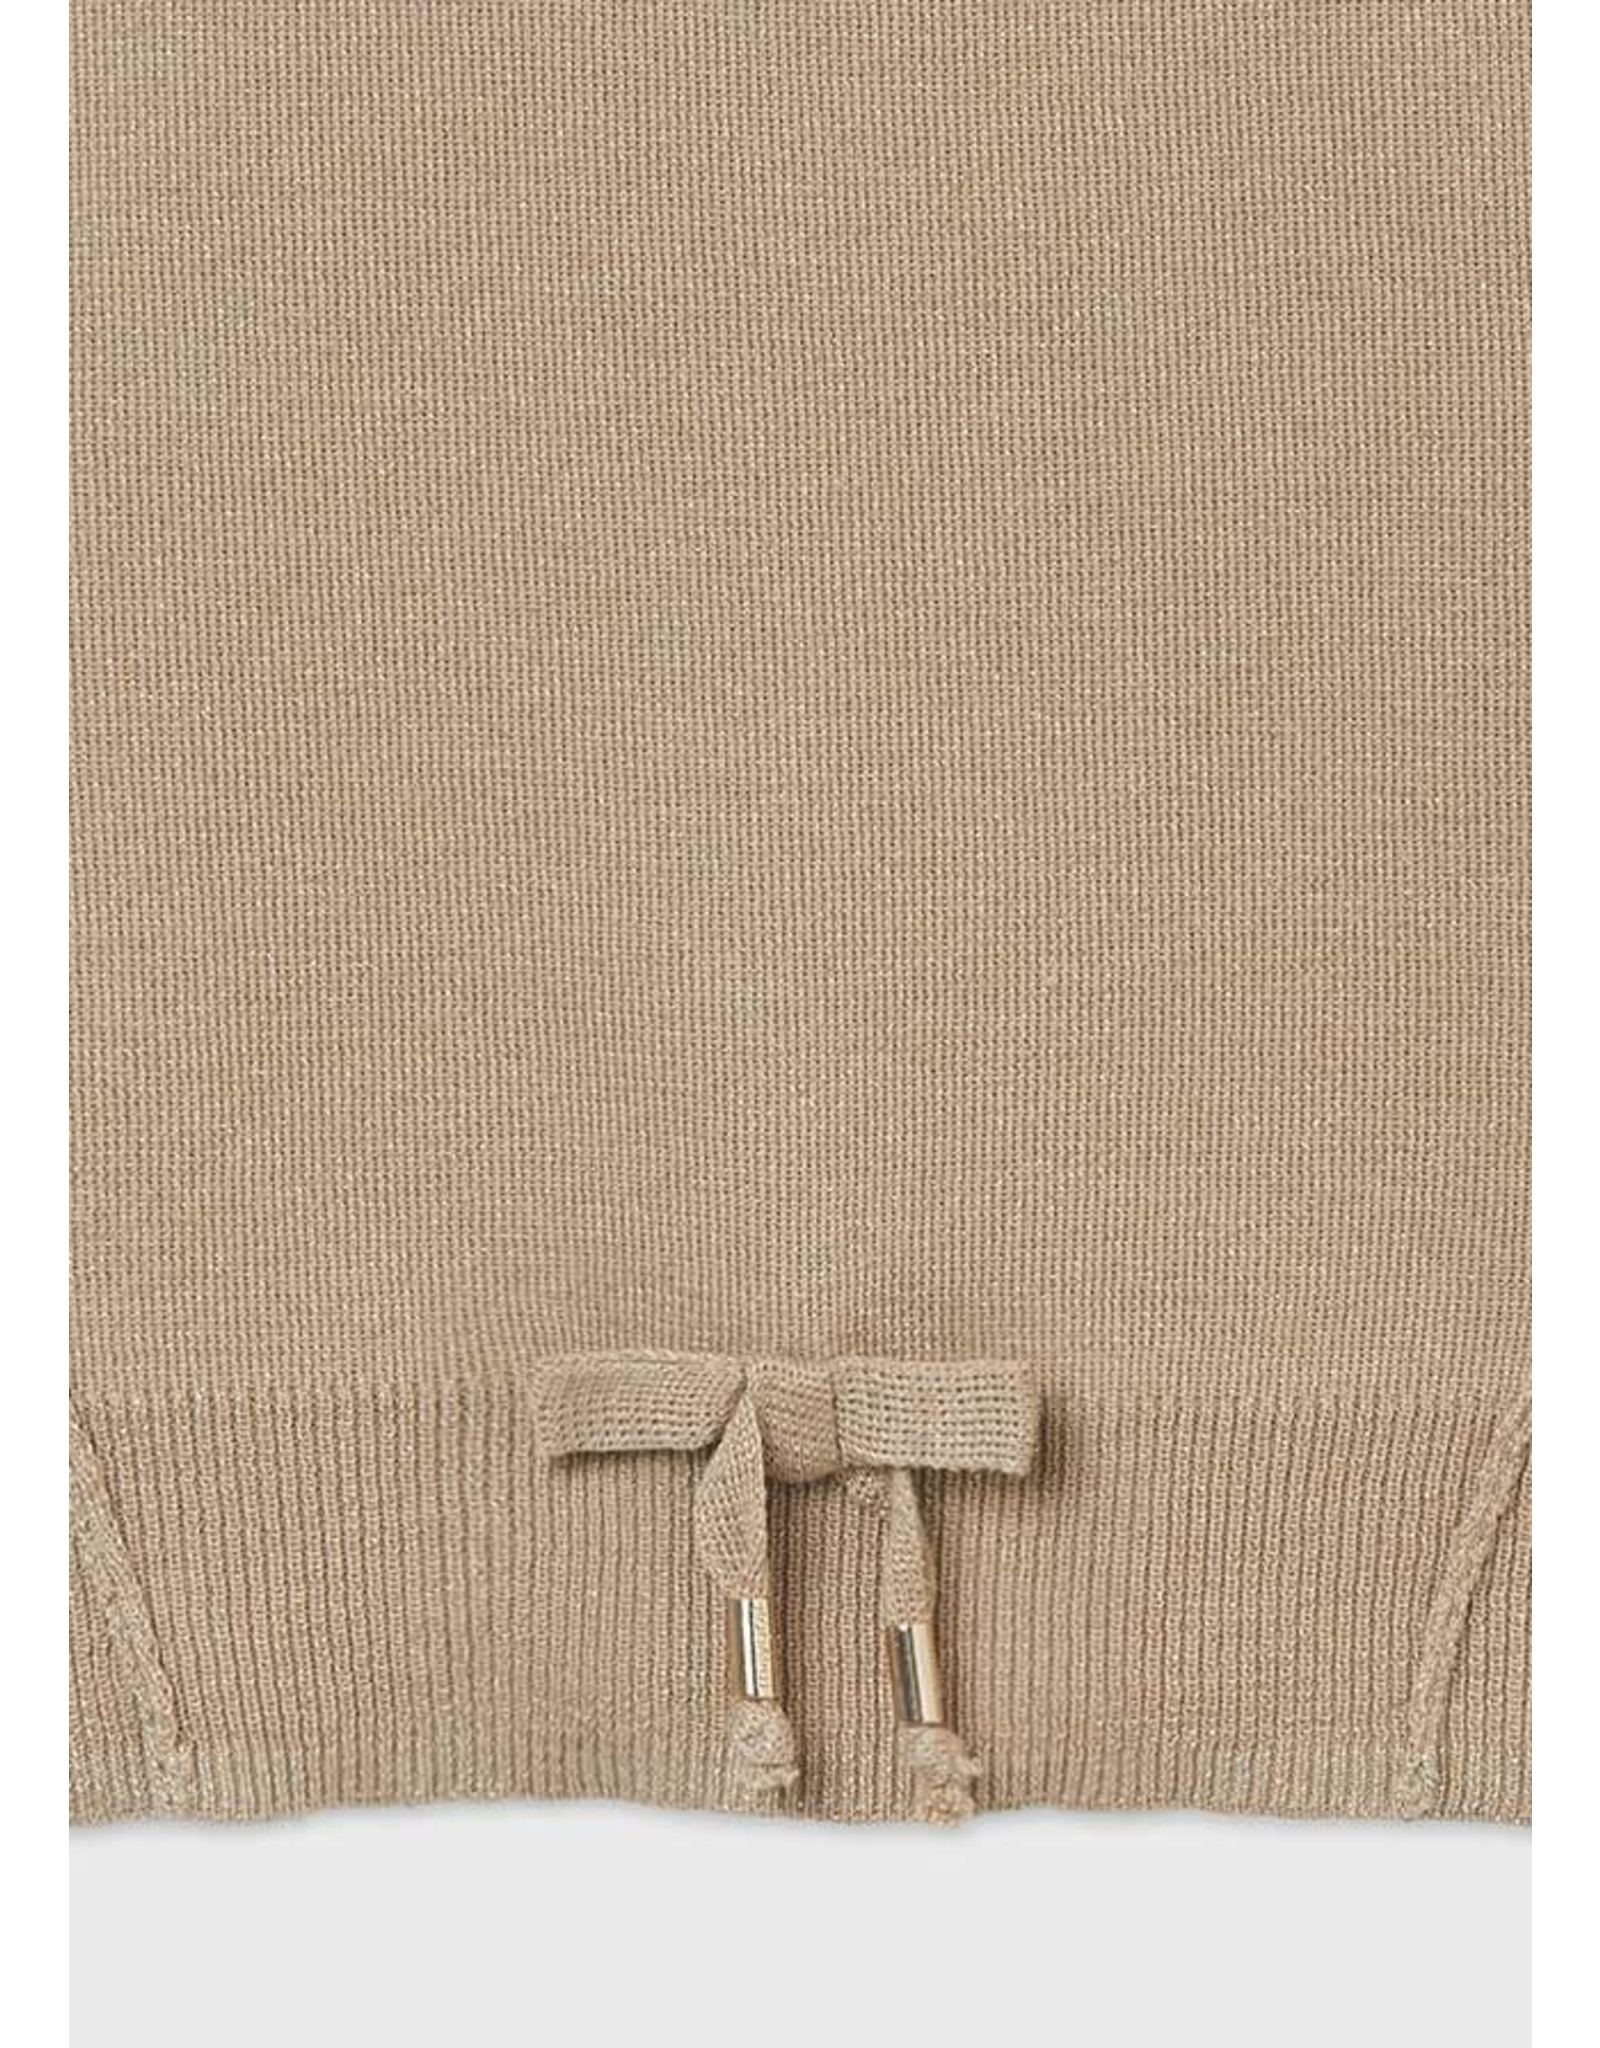 Mayoral Camel Knit Sweater/Trouser Set